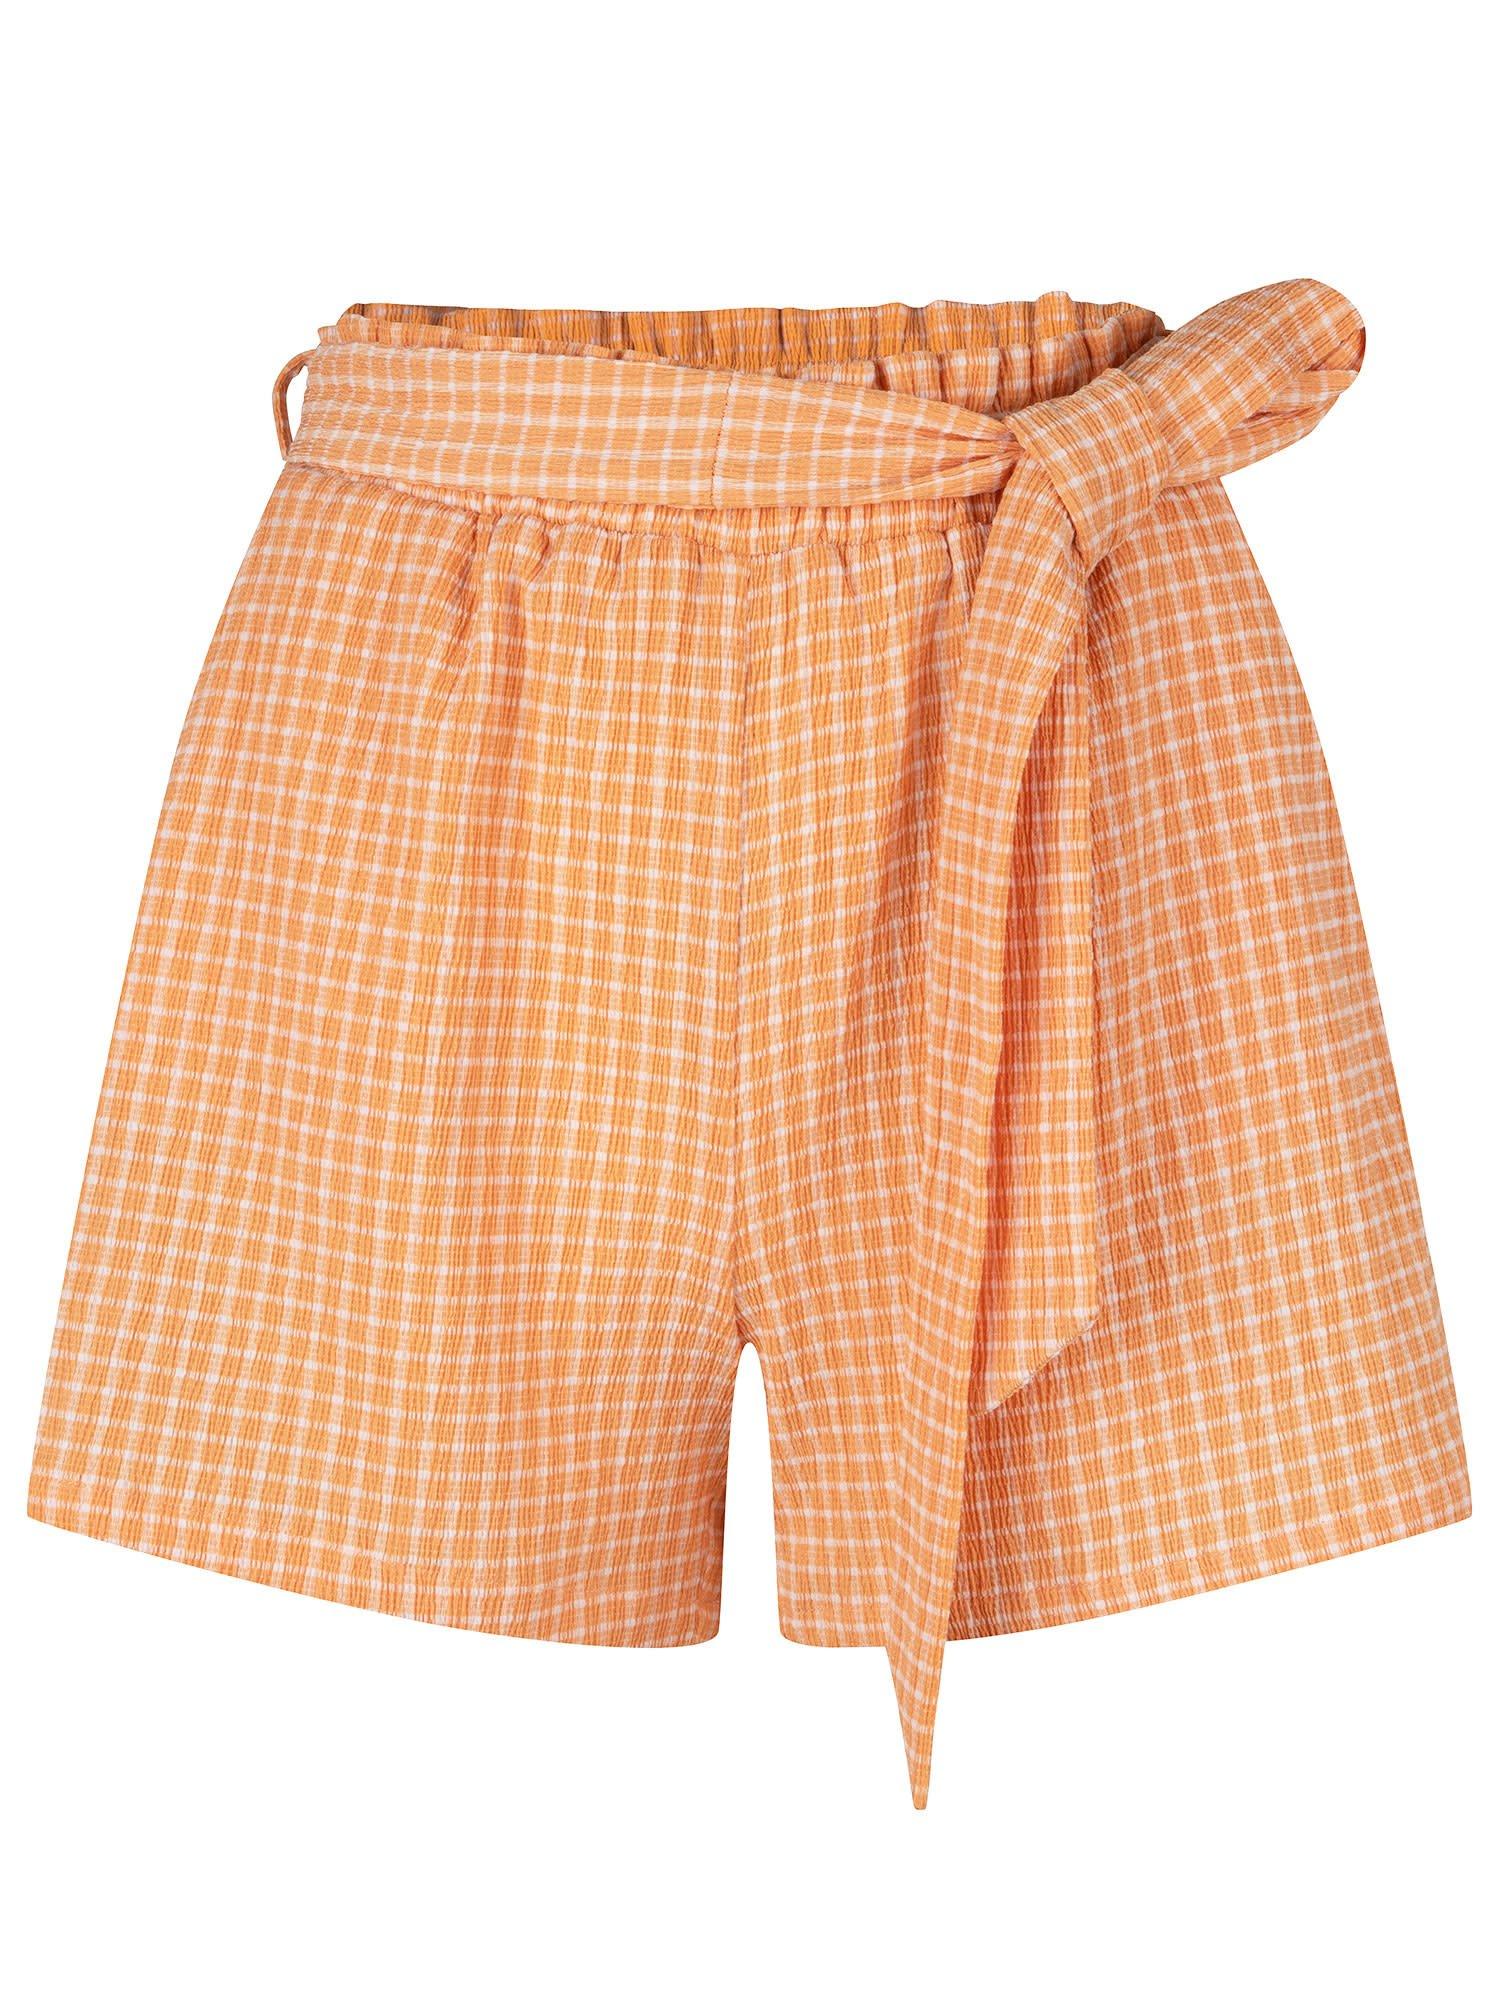 YDENCE YDENCE - Short rylee oranje check